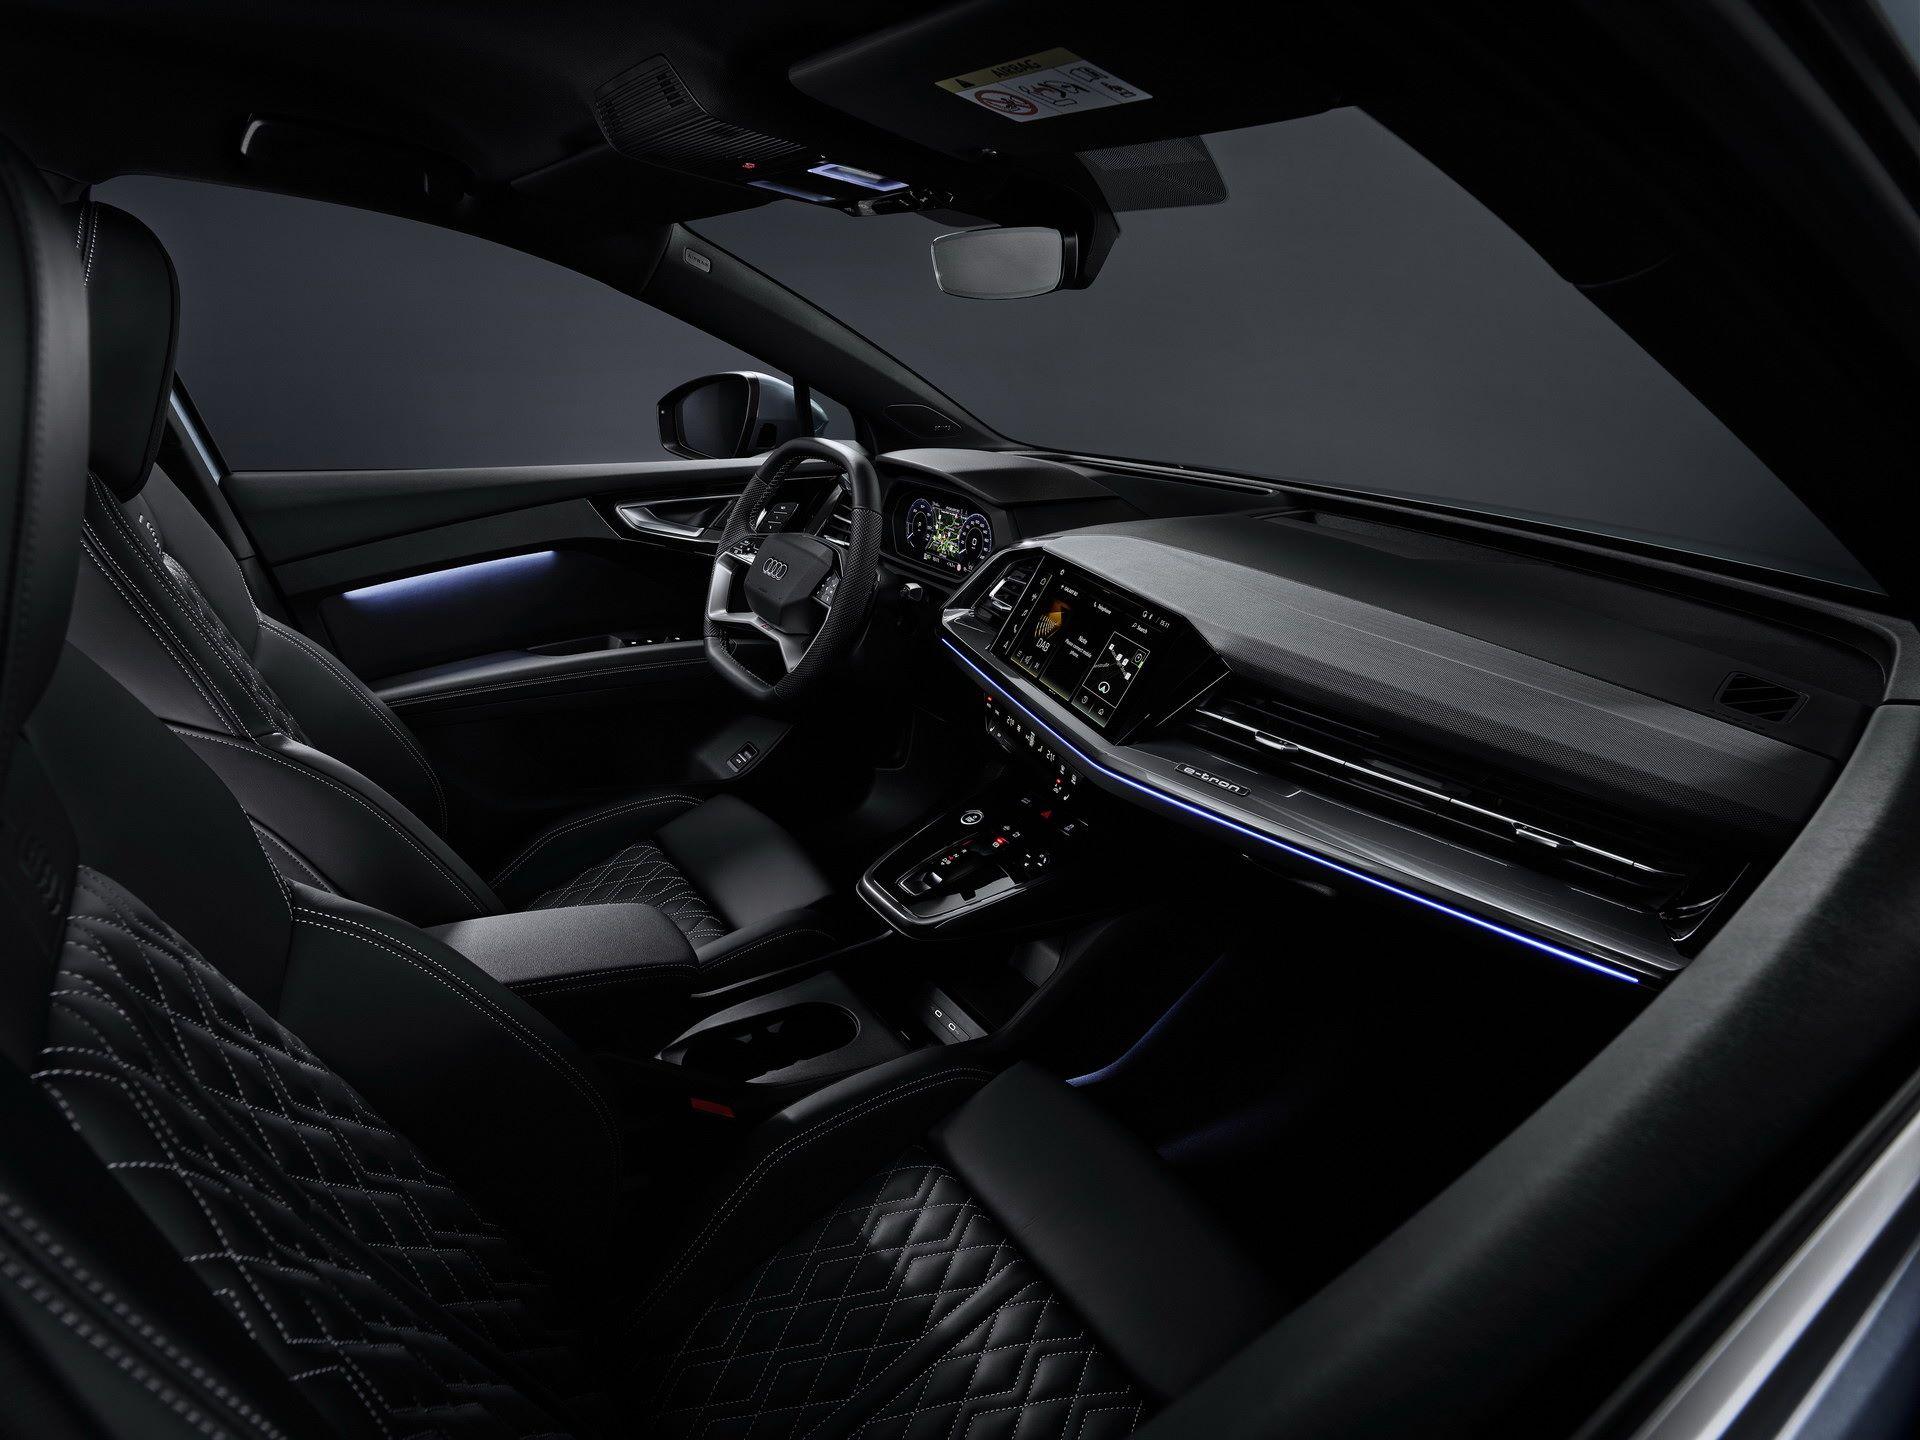 1_Audi-Q4-e-tron-and-Q4-e-tron-Sportback-70